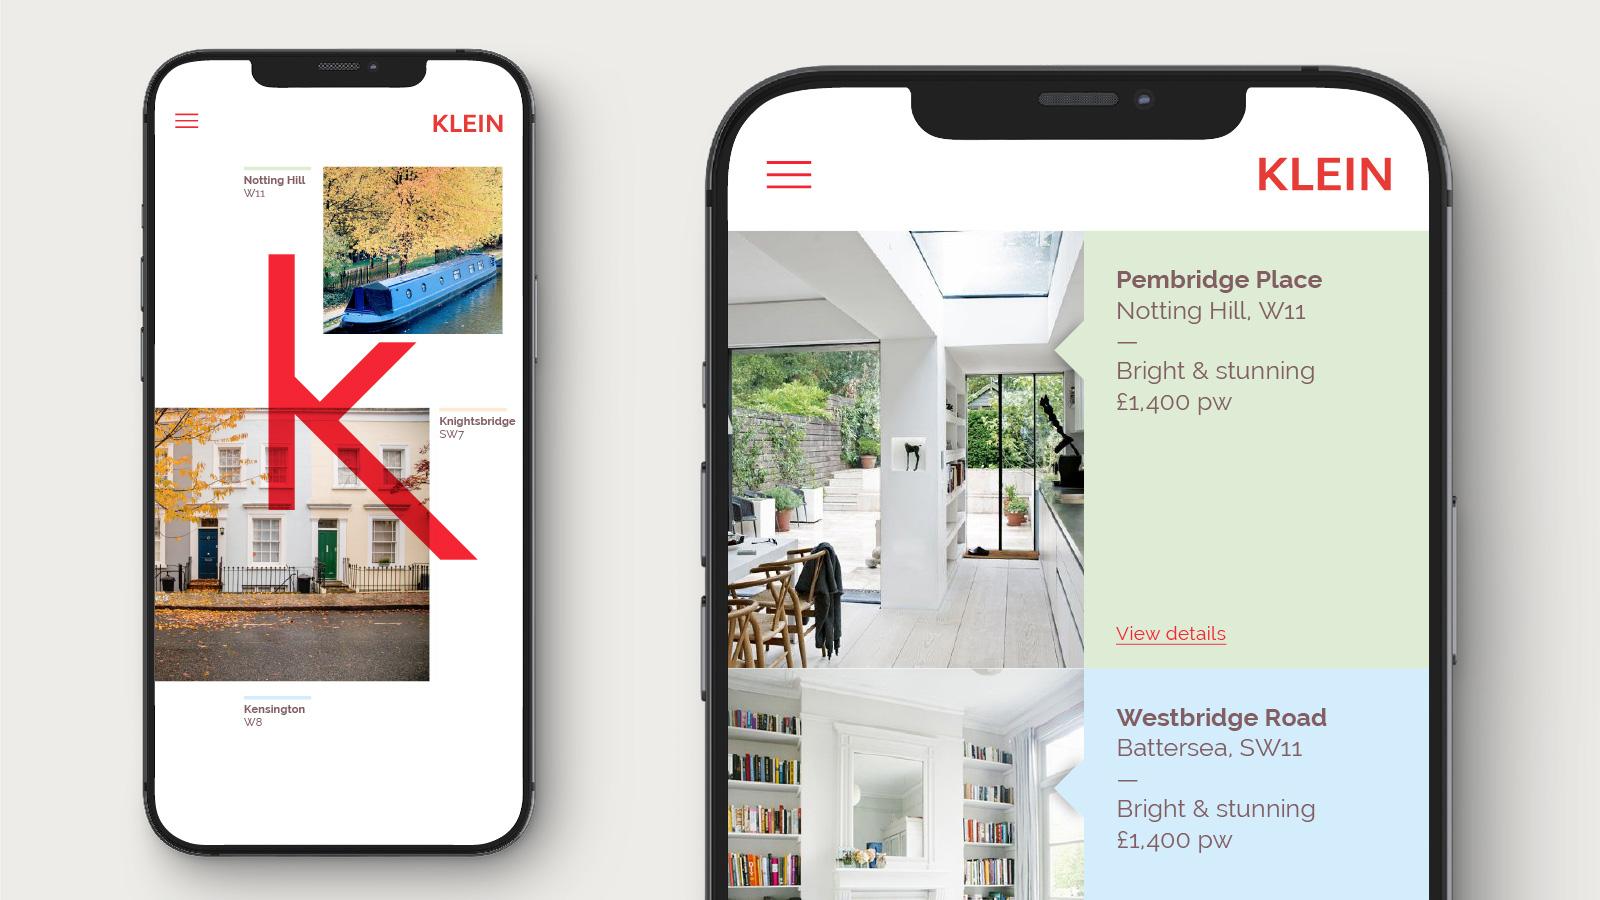 property-agency-visual-branding-identity-design-milton-keynes-london-12